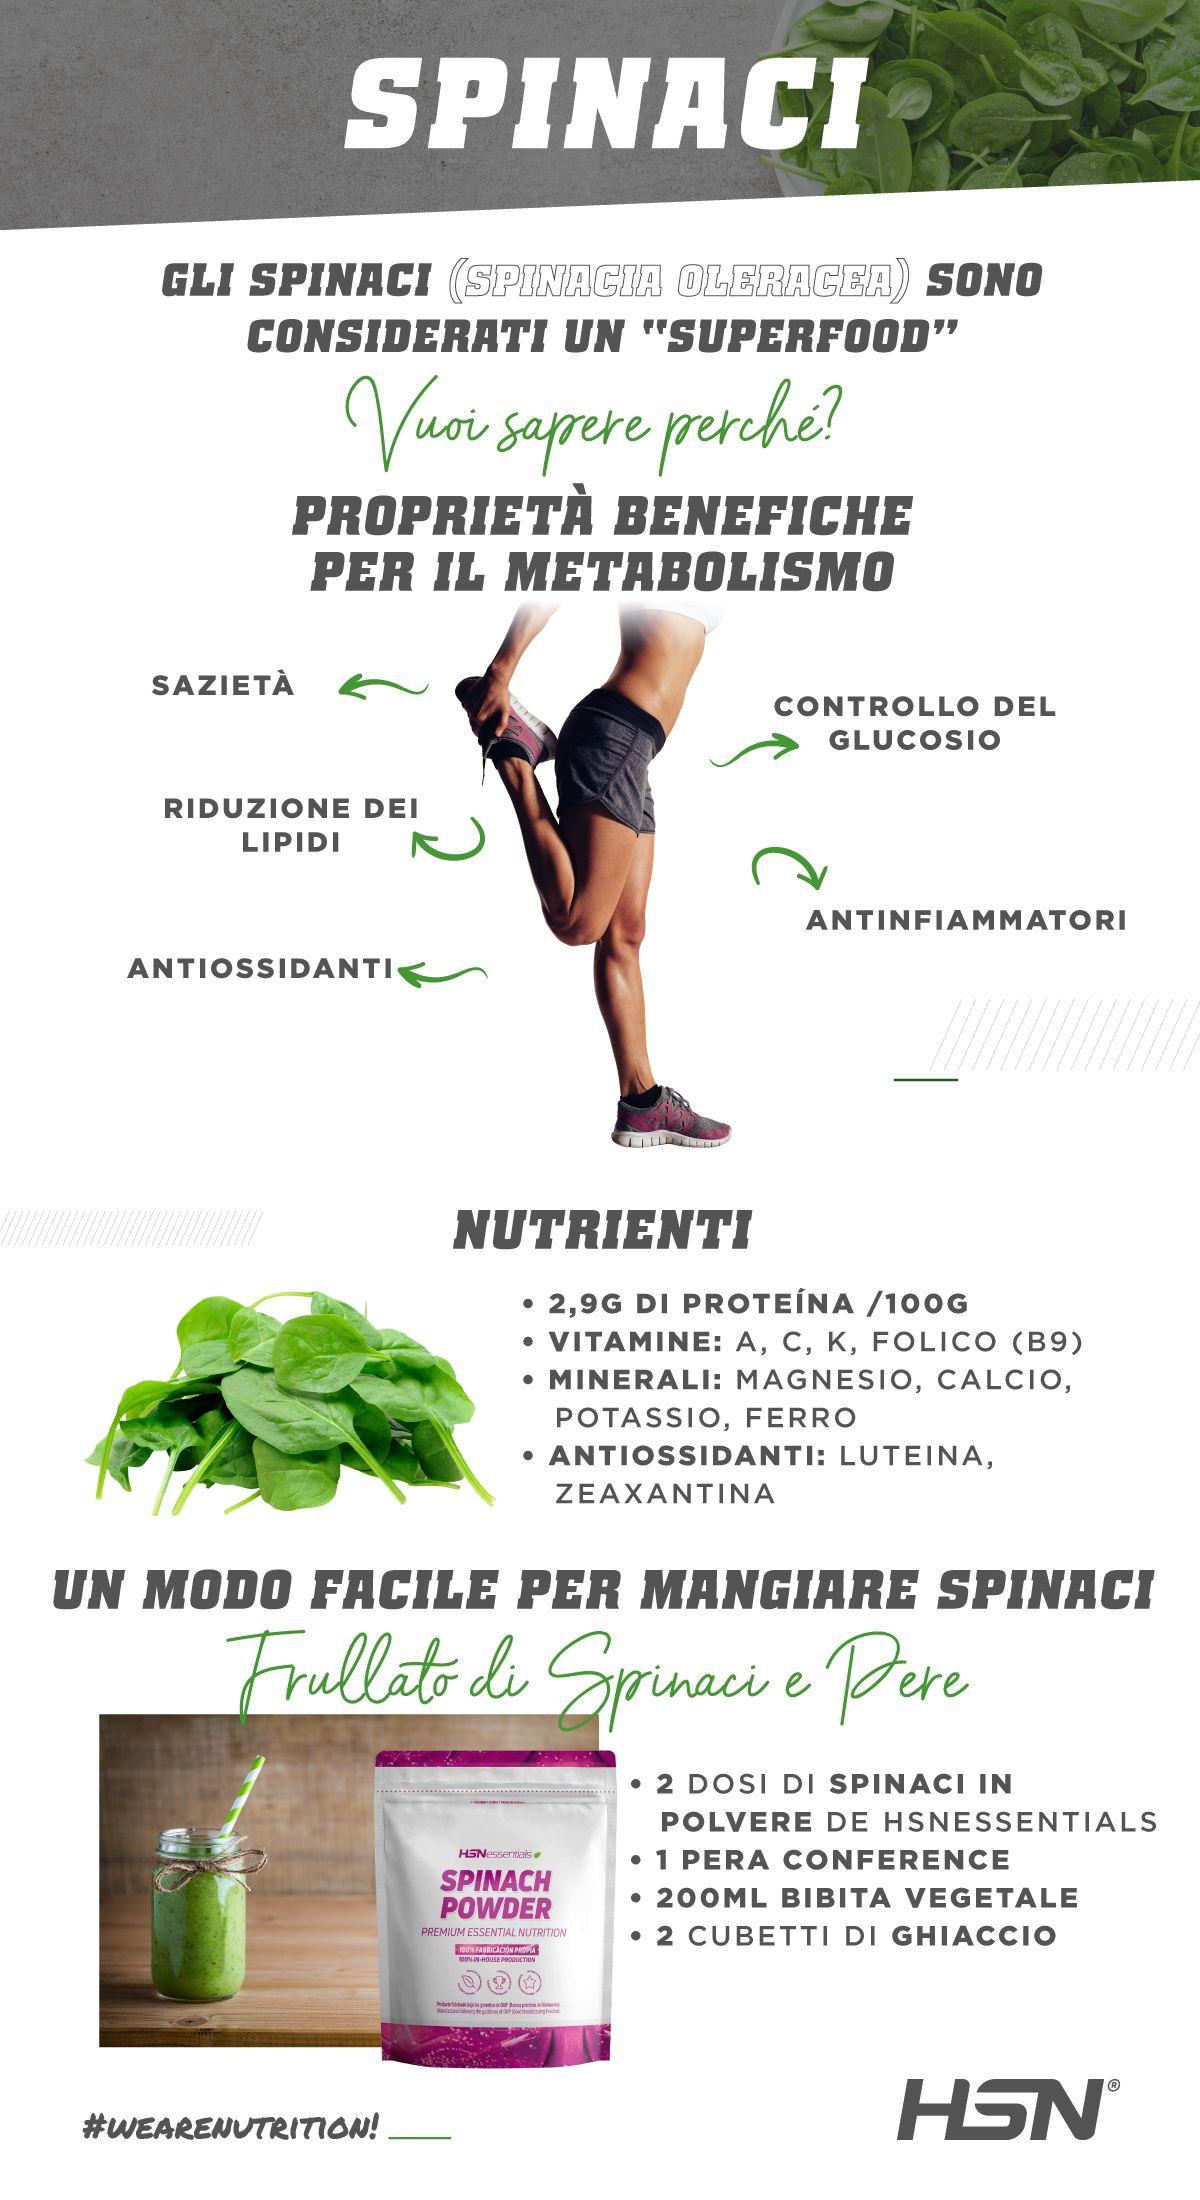 Spinaci: Superfood